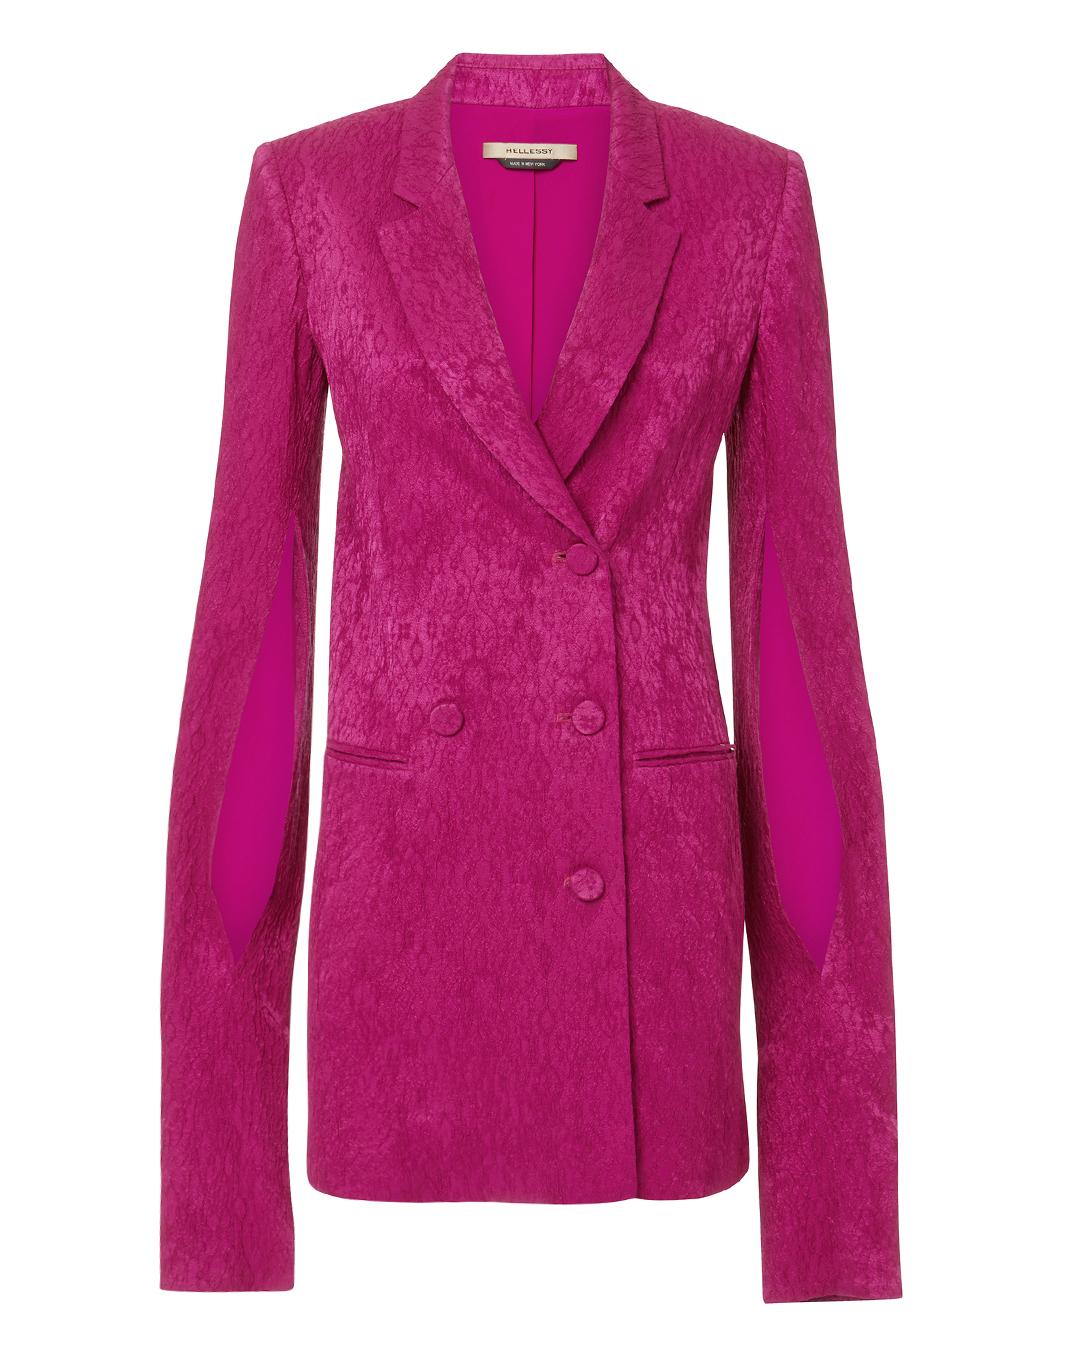 HELLESSY Thatcher Blazer Dress